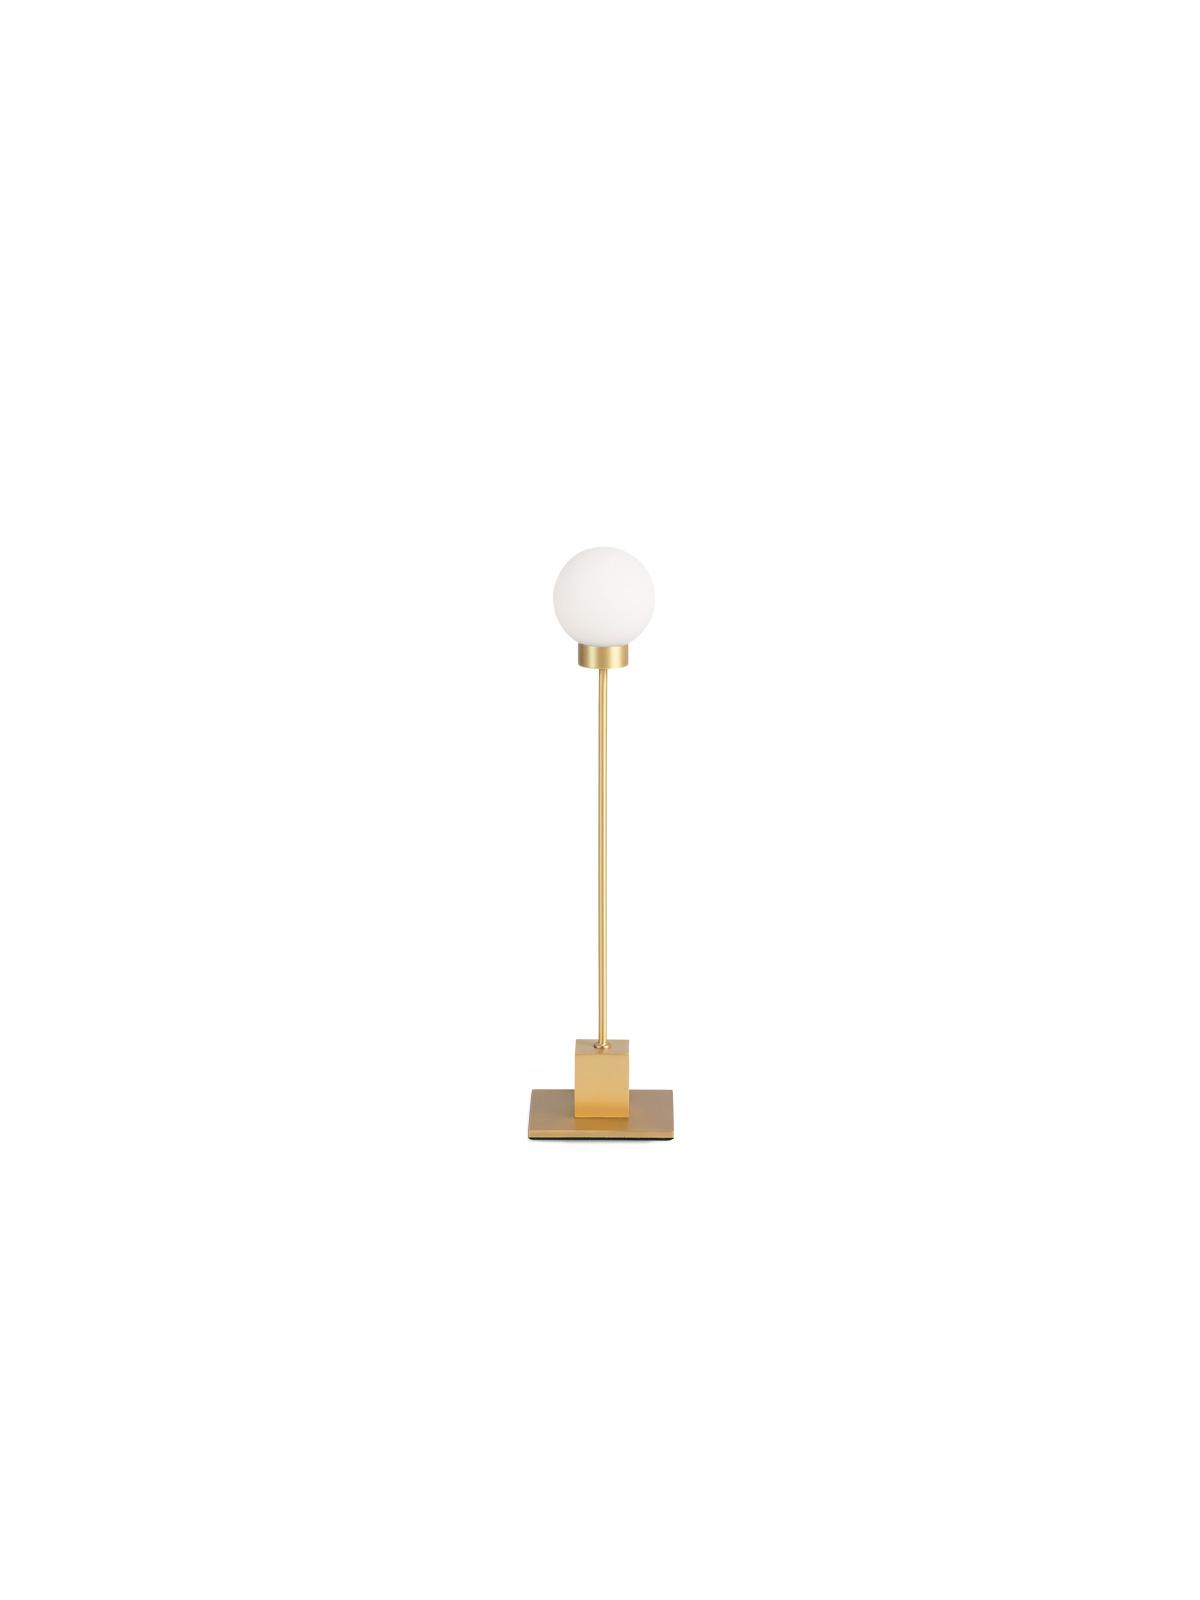 Northern Lighting Snow Ball Table Designort Lampen Berlin Onlineshop